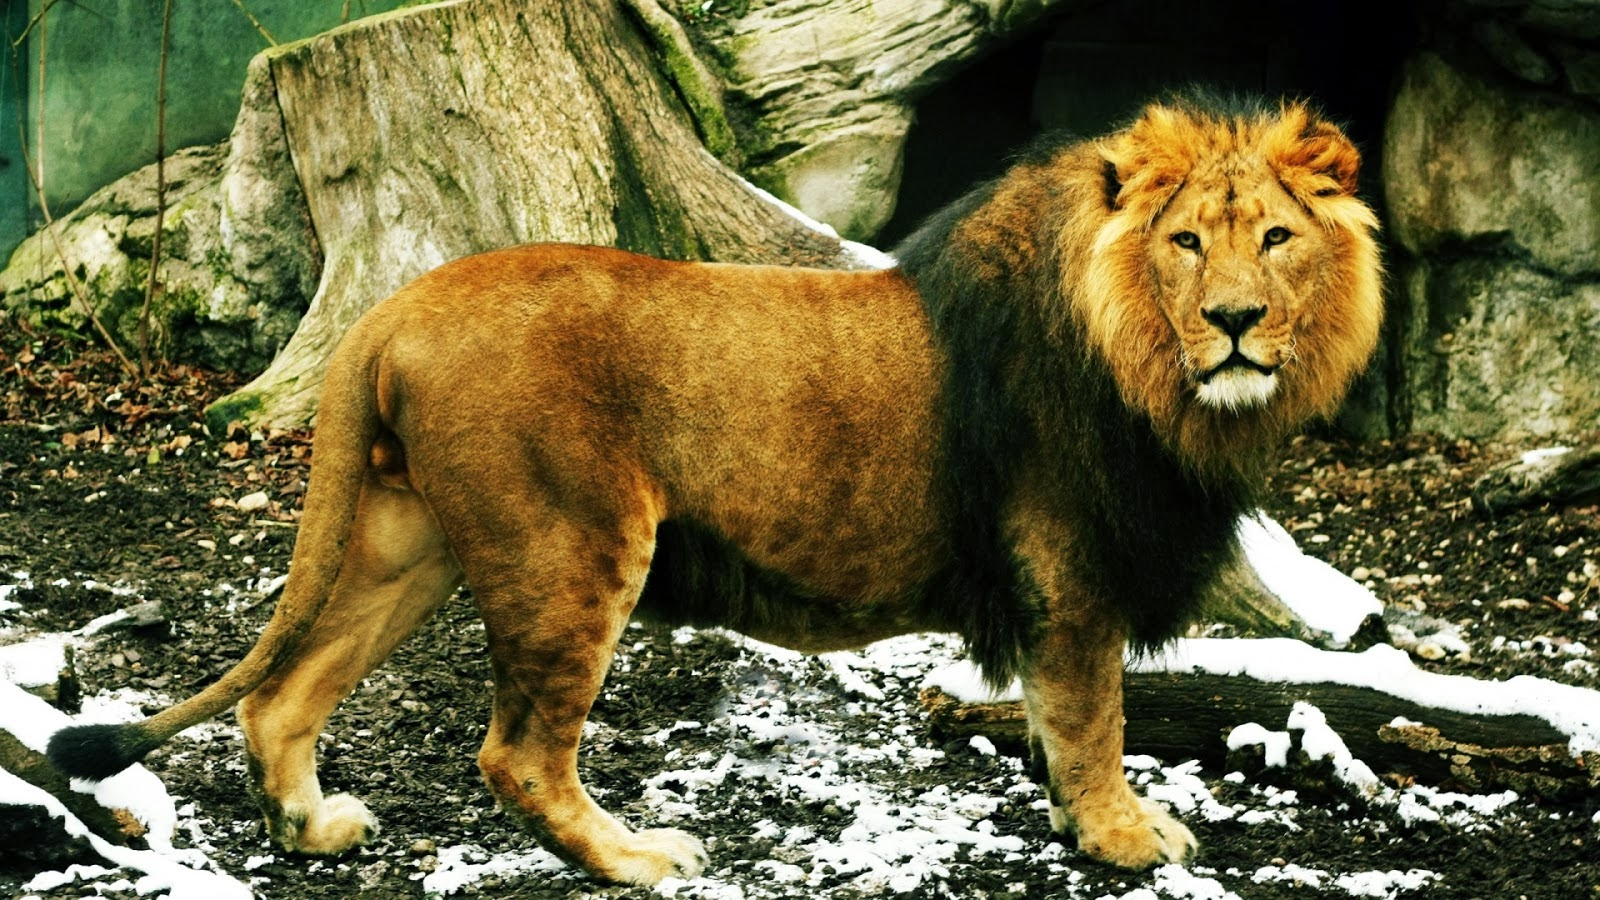 Popular Wallpaper Lion Facebook - lion+wallpapers+hd+(4)  Picture_99335.jpg